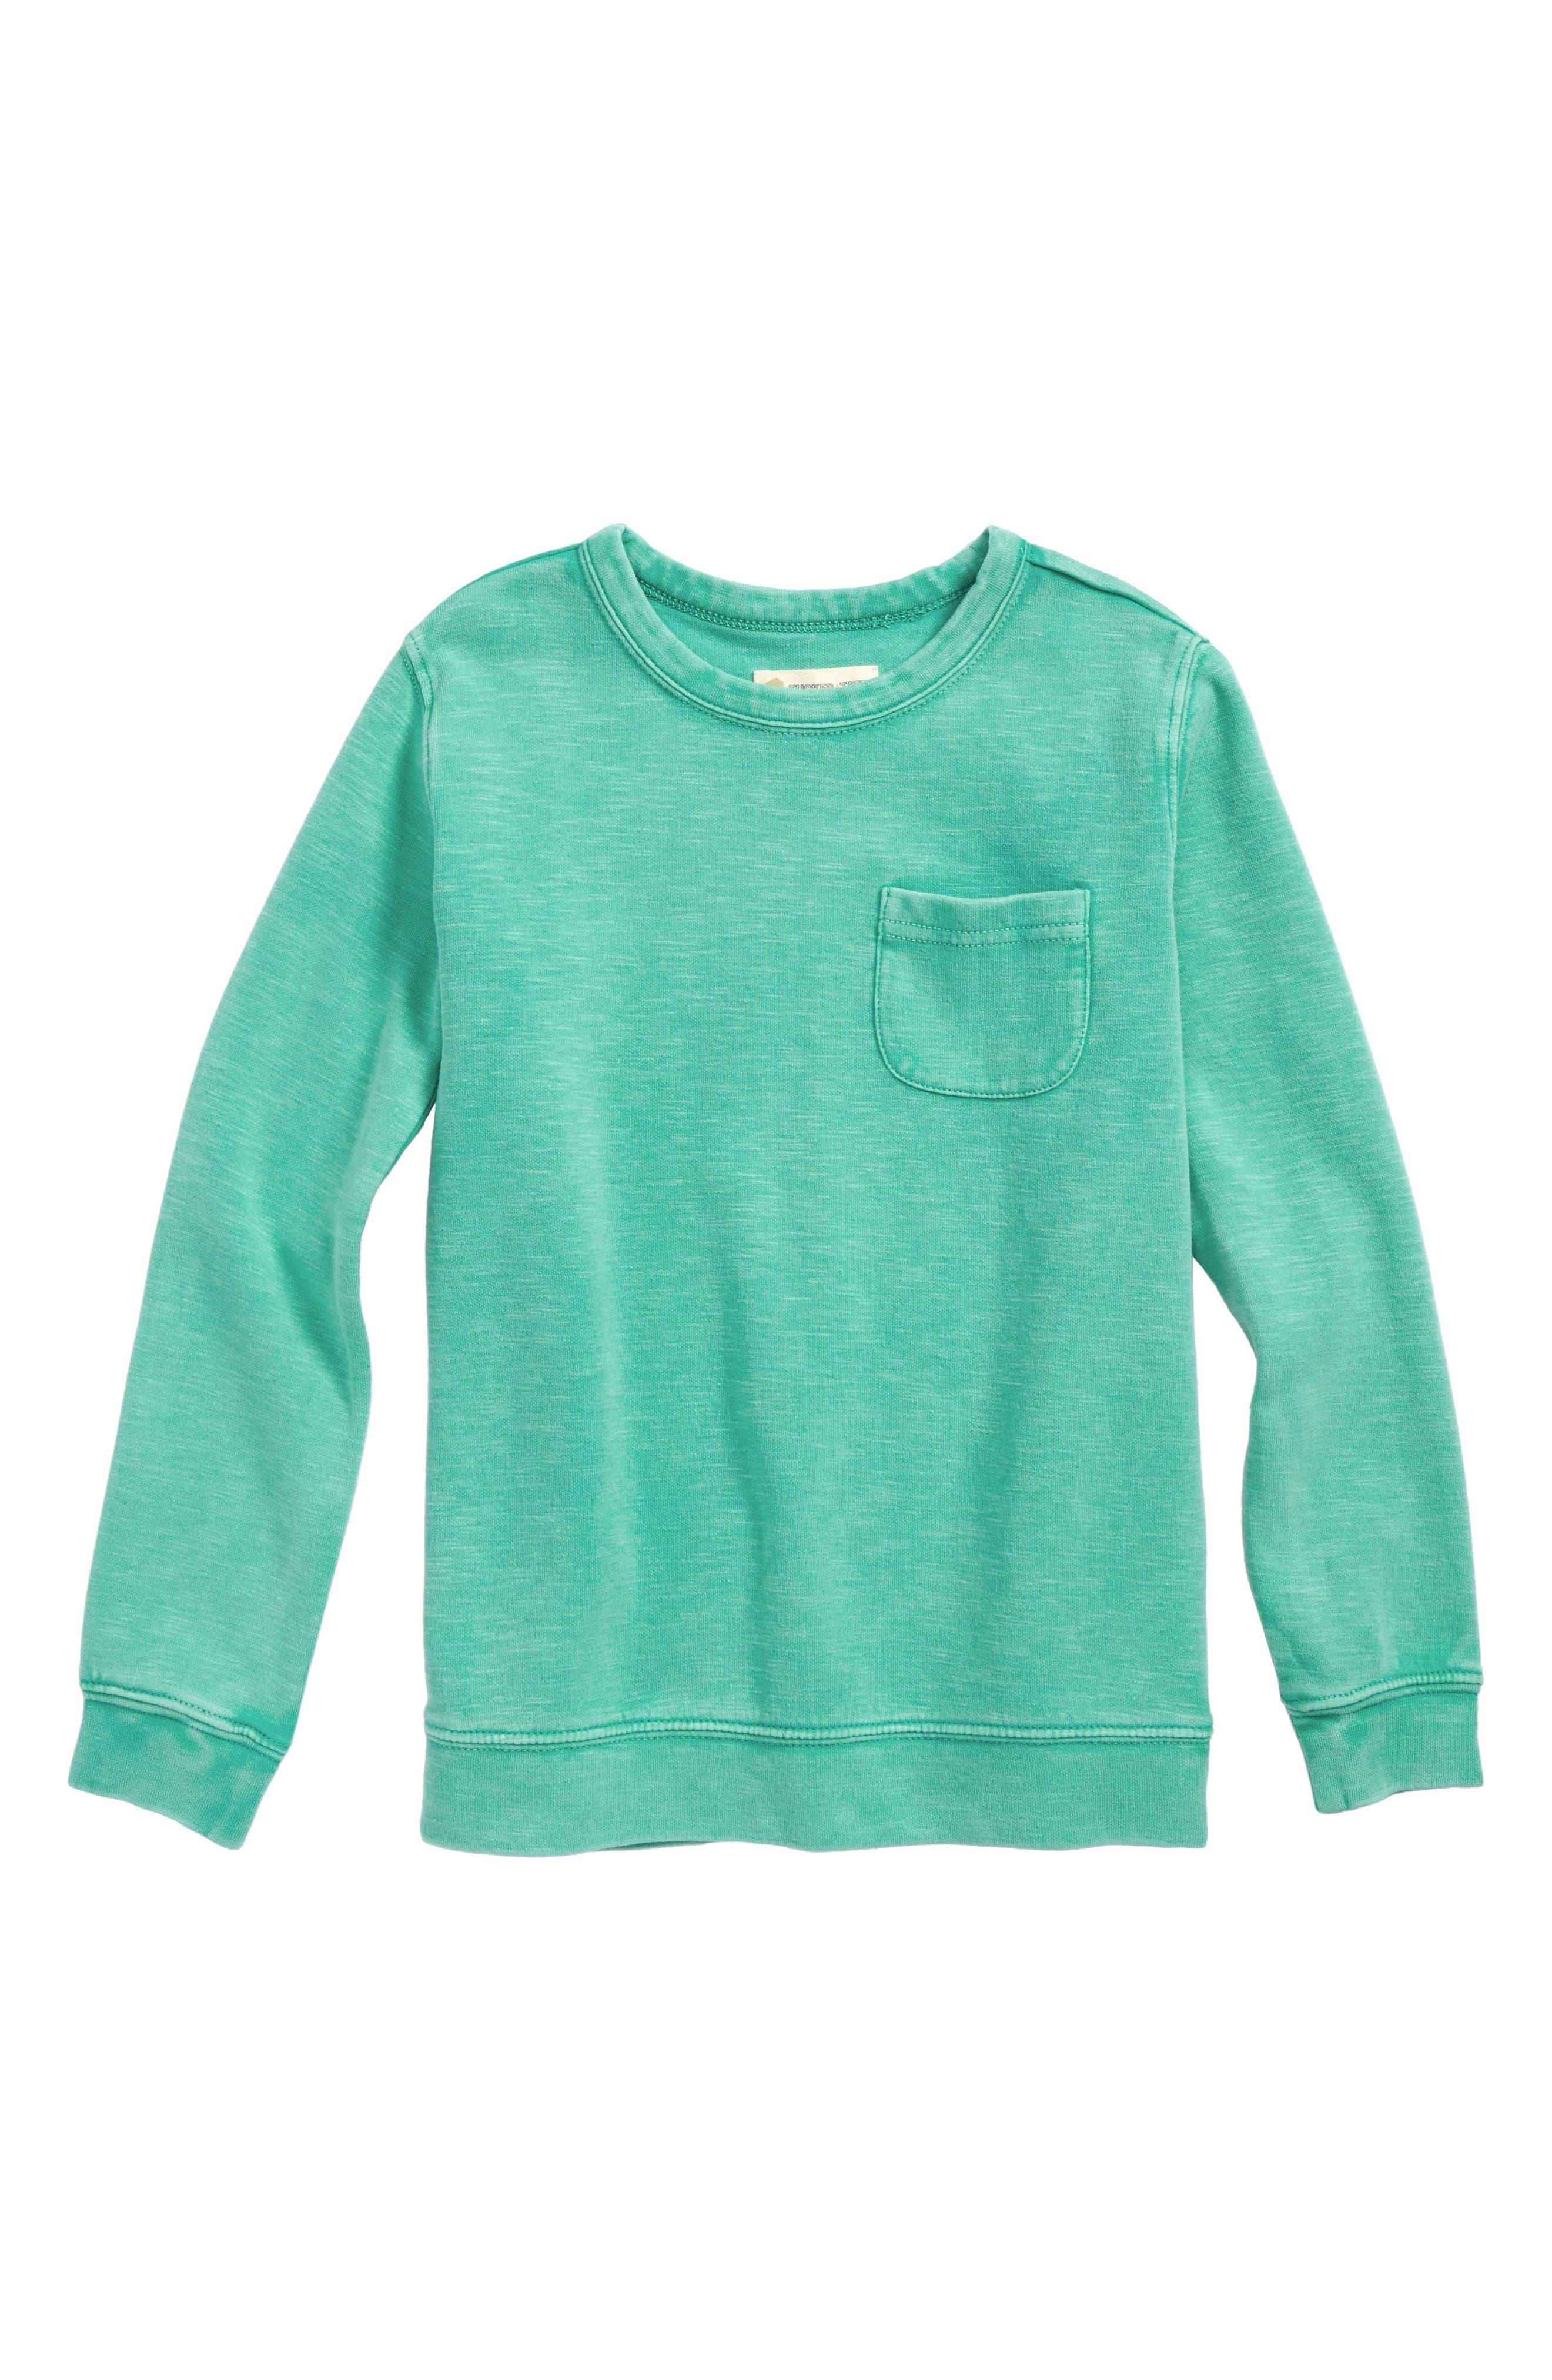 Interlock T-Shirt,                             Main thumbnail 1, color,                             301